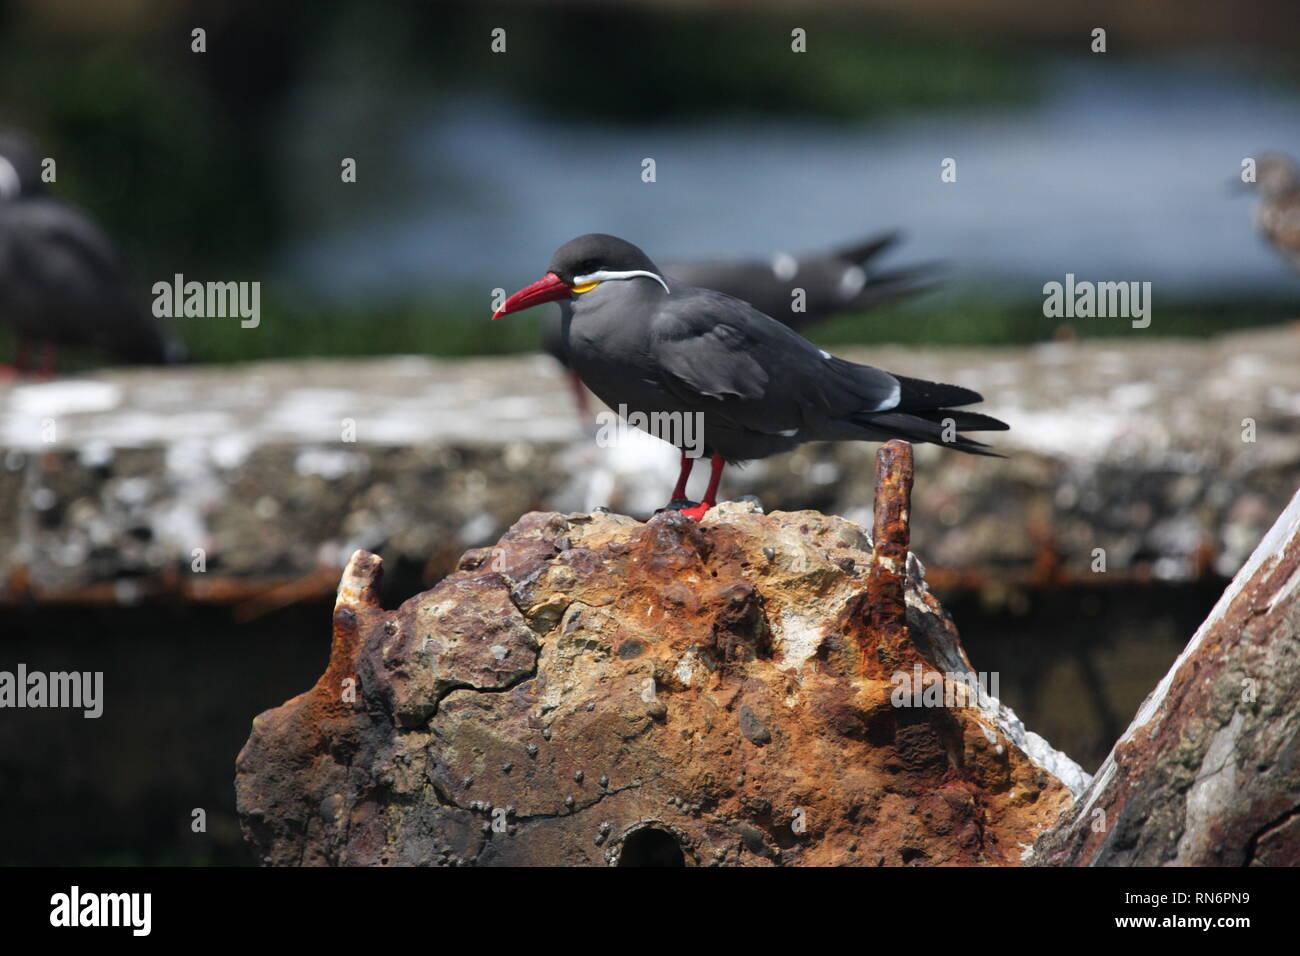 Inca tern (Larosterna inca) in Paracas National Reserve, Peru Stock Photo